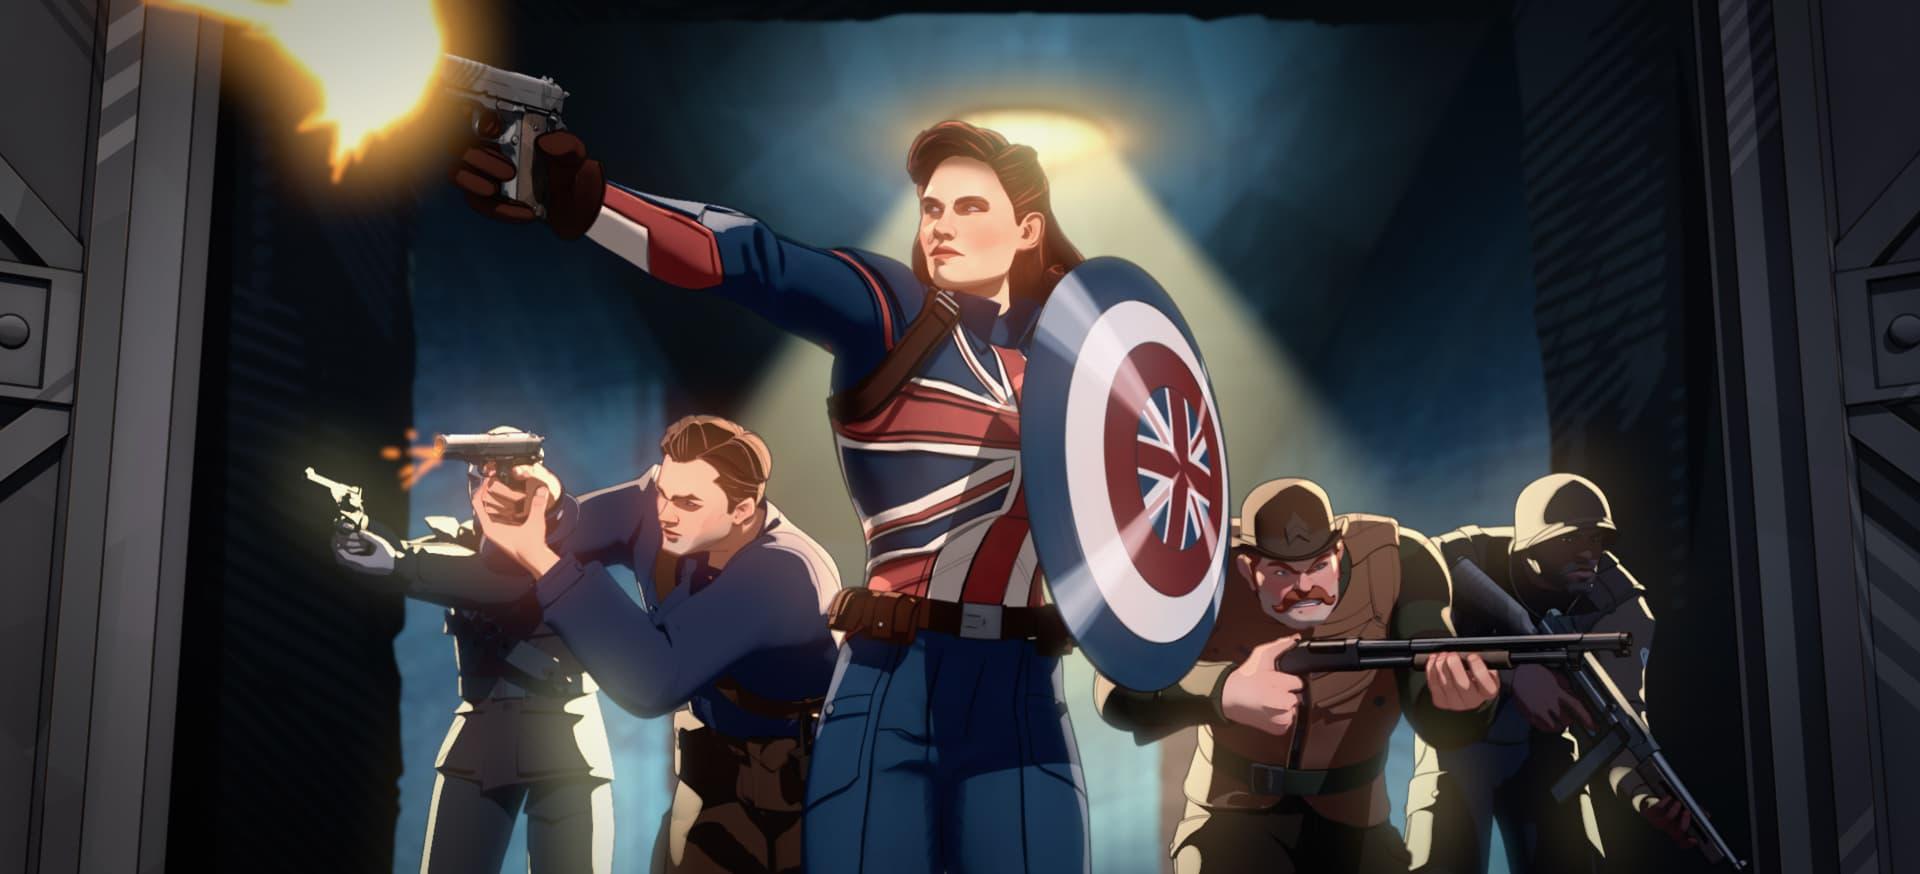 Captain Carter, Bucky Barnes, Dum Dum Dugan | What If...?